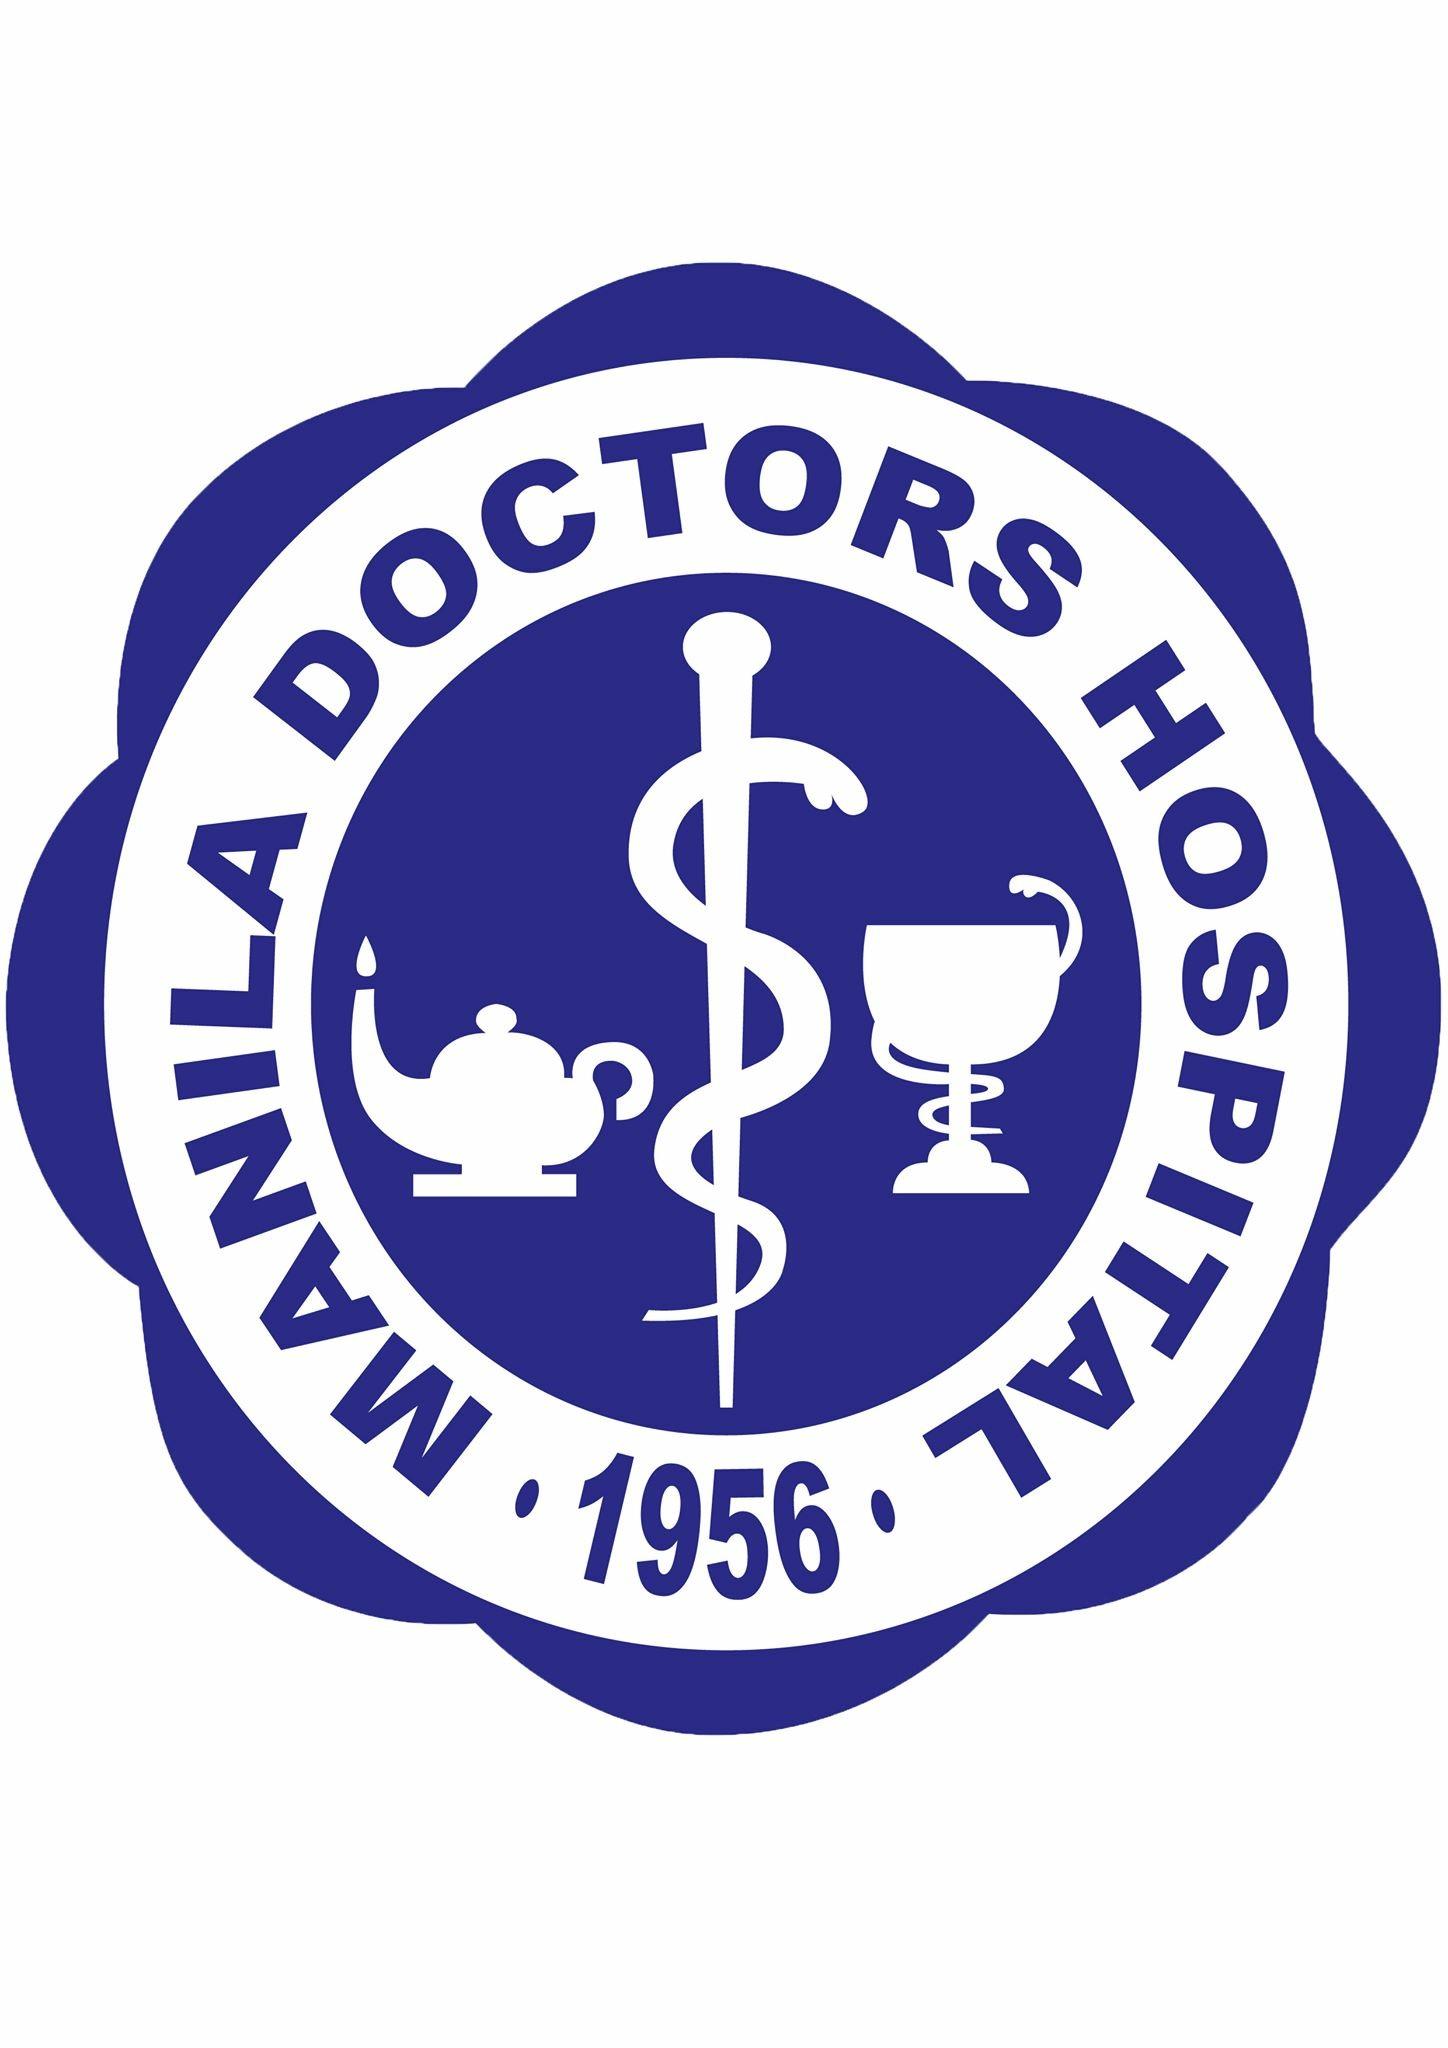 Manila Doctors Hospital - Room No. 318